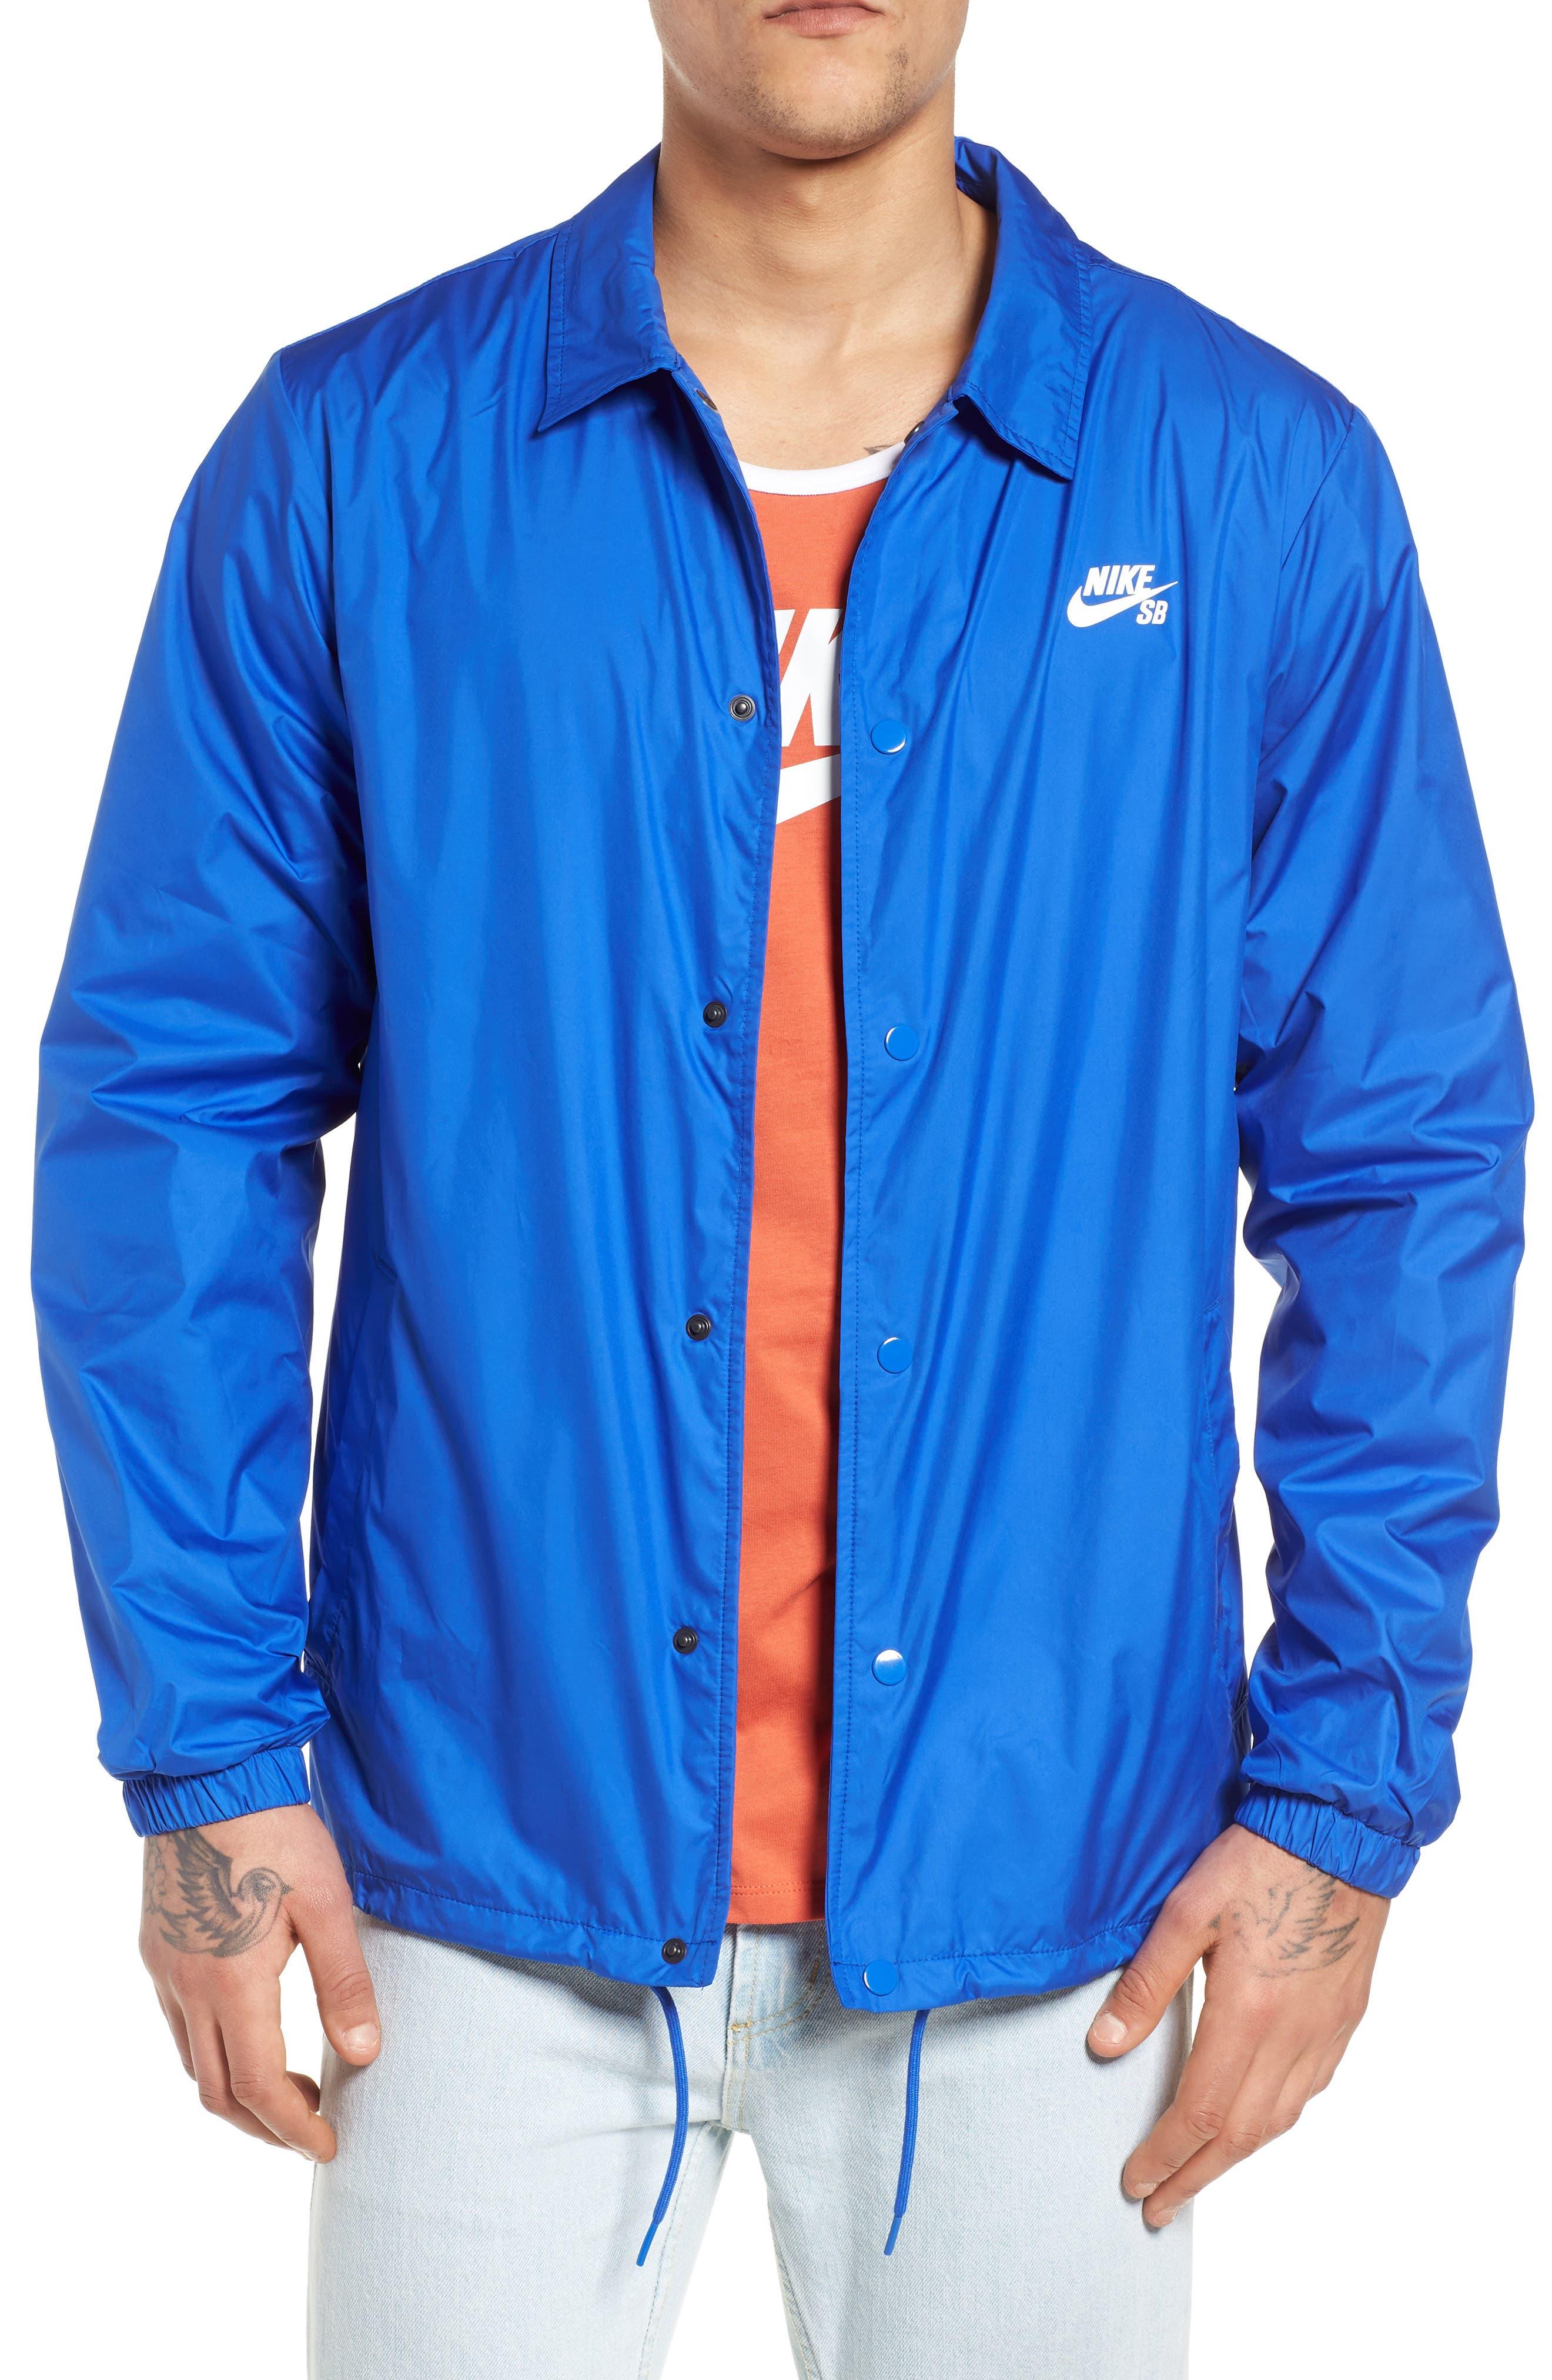 SB Shield Coach's Jacket,                             Main thumbnail 1, color,                             HYPER ROYAL/ WHITE